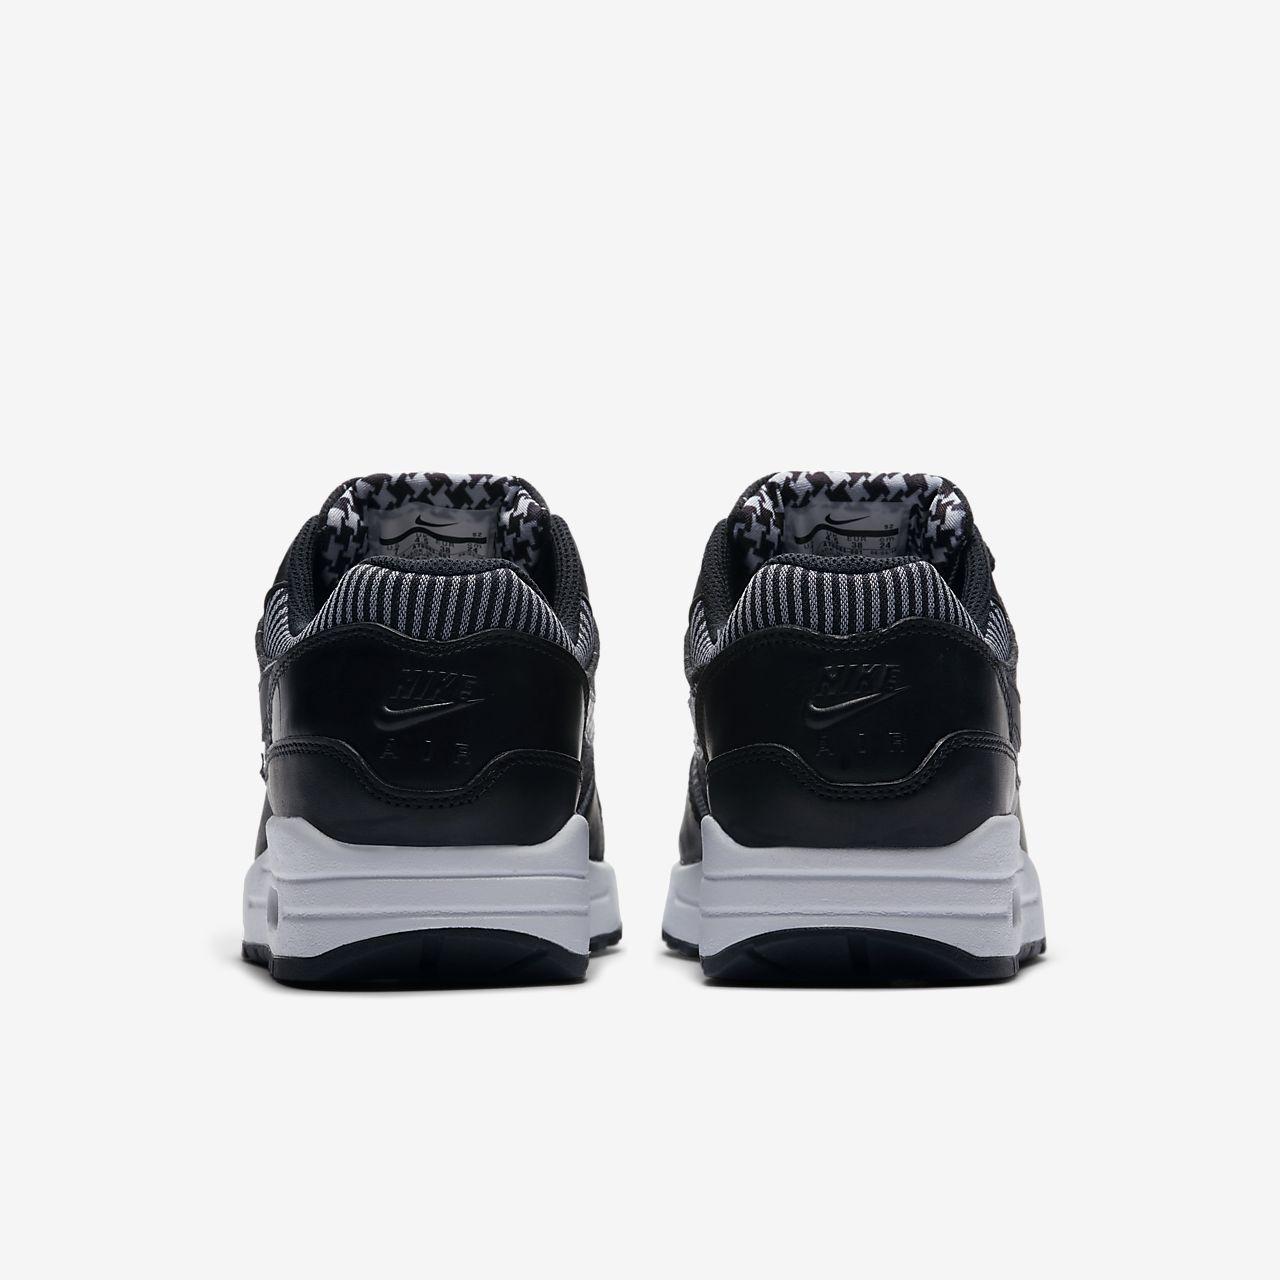 73d4f791637 Nike Air Max 1 SE Women s Shoe. Nike.com CA